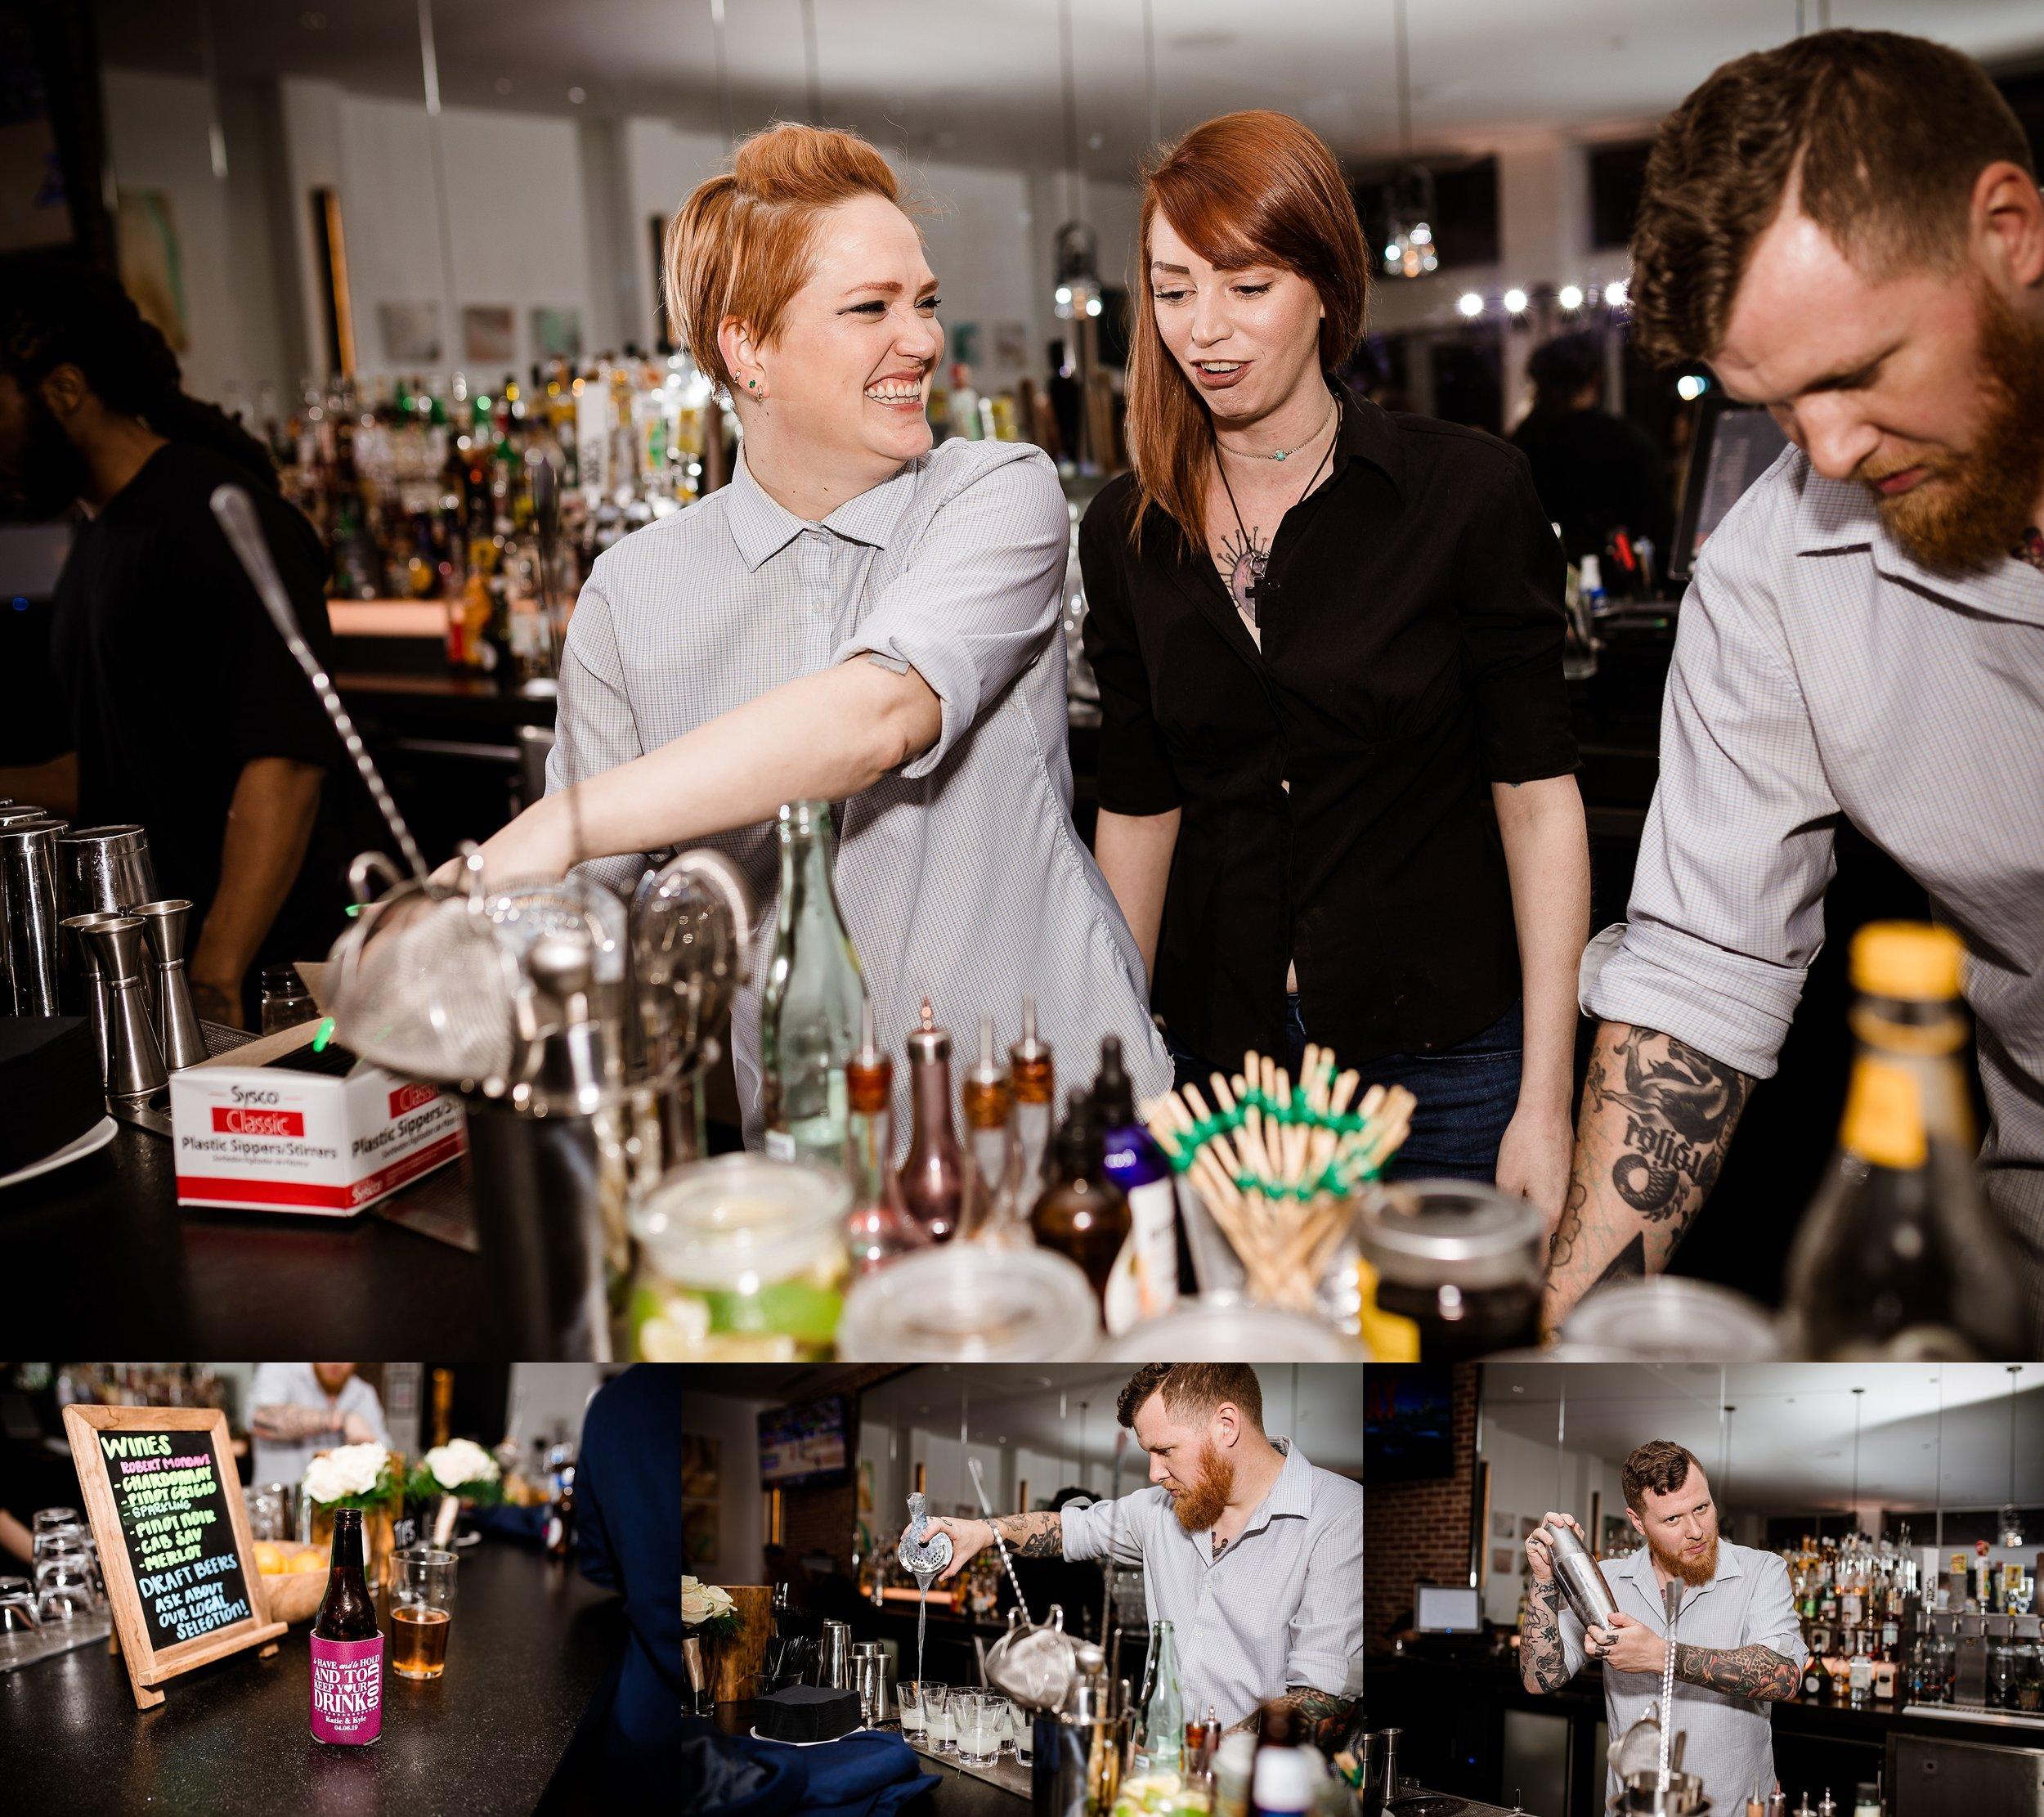 Behind the scenes making those drinks!